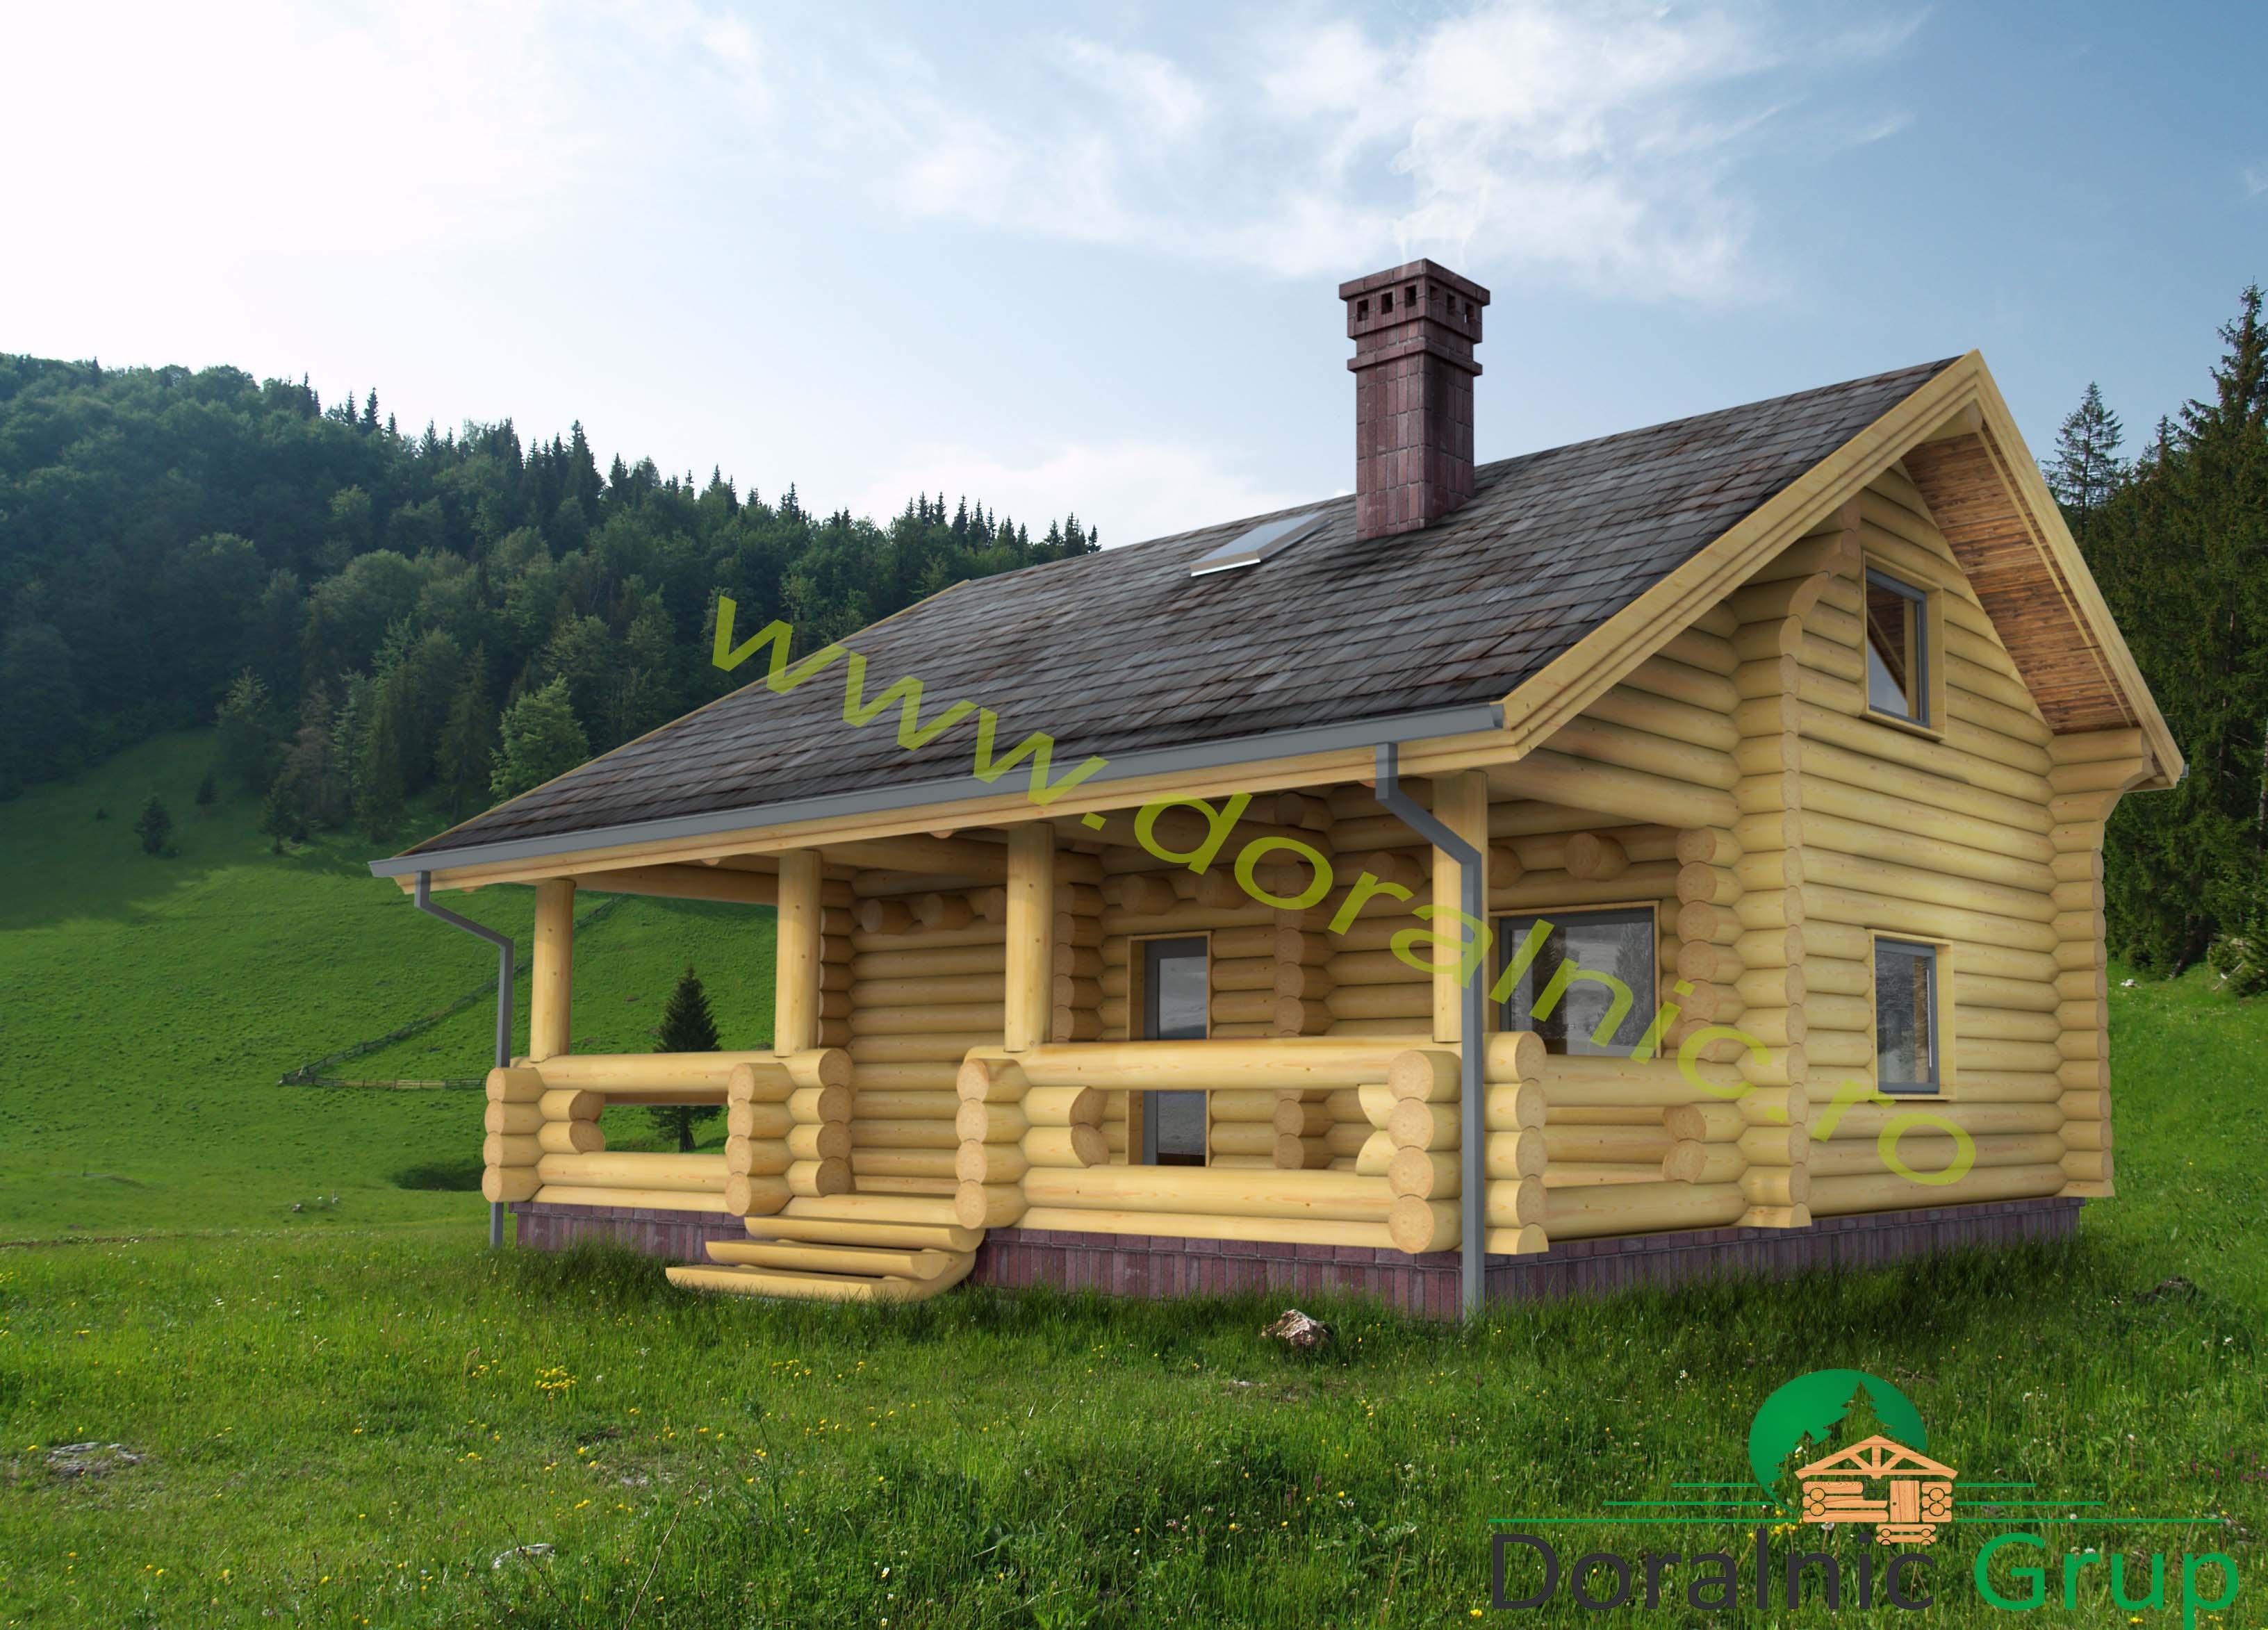 Proiect Casa Din Lemn.Proiect Doralnic 9 Case Din Busteni Cabane Din Lemn